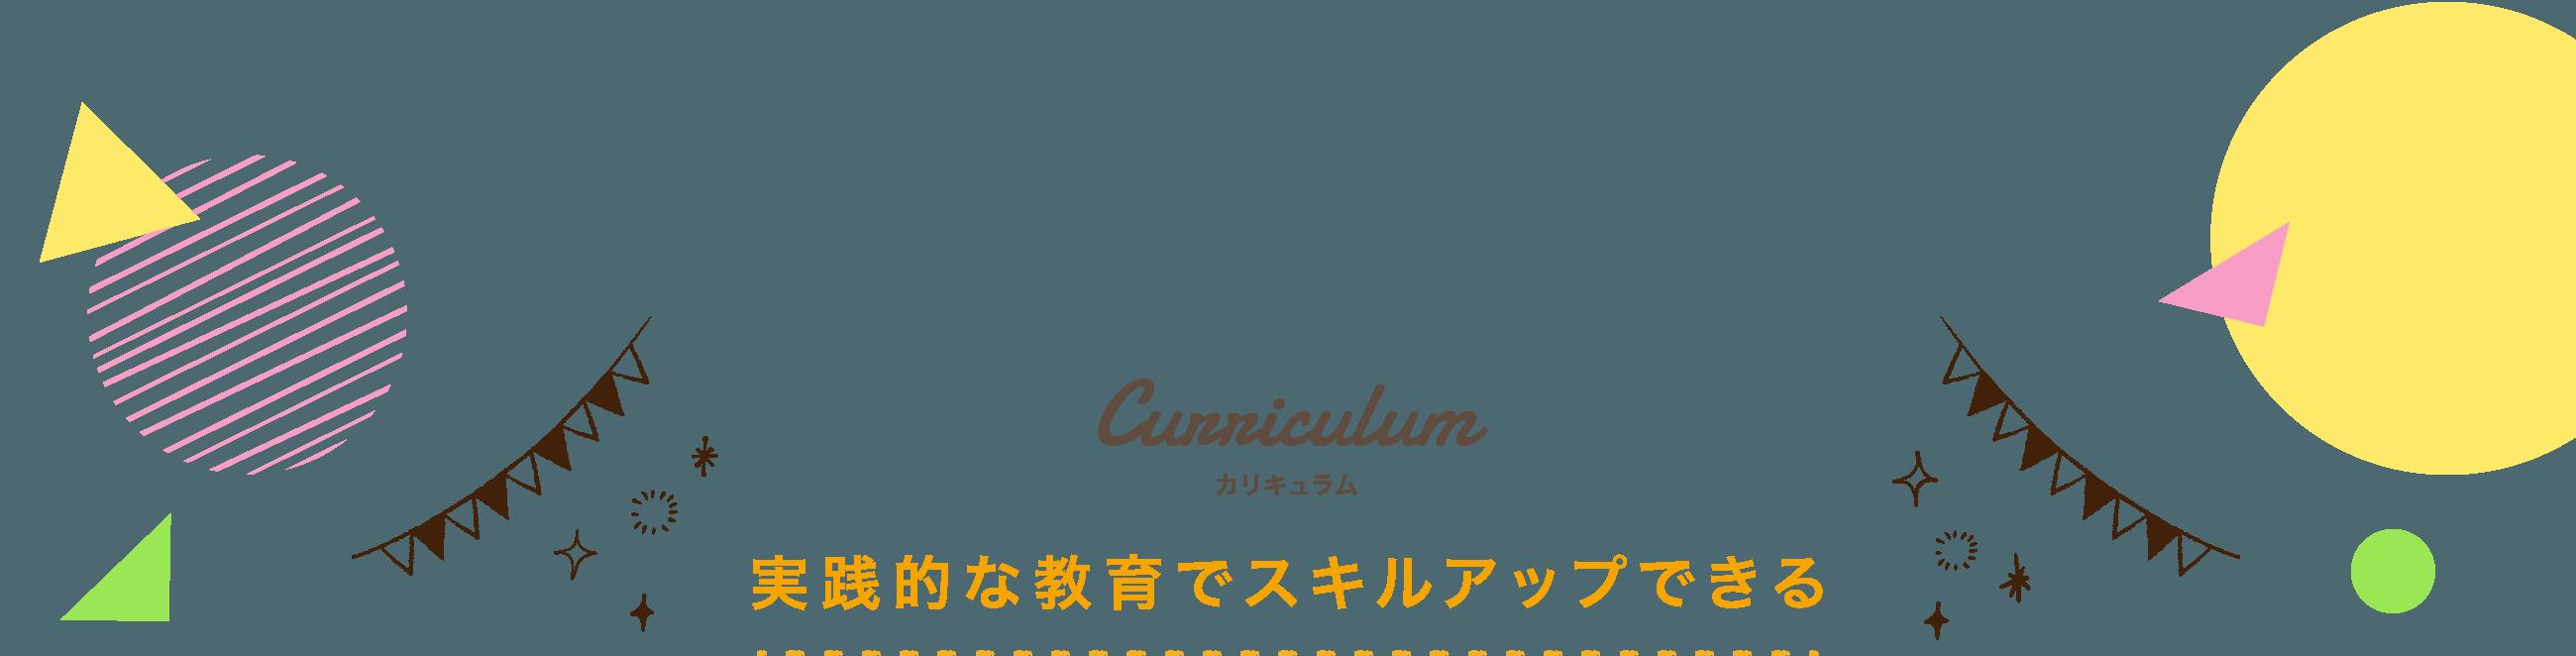 curriculum カリキュラム